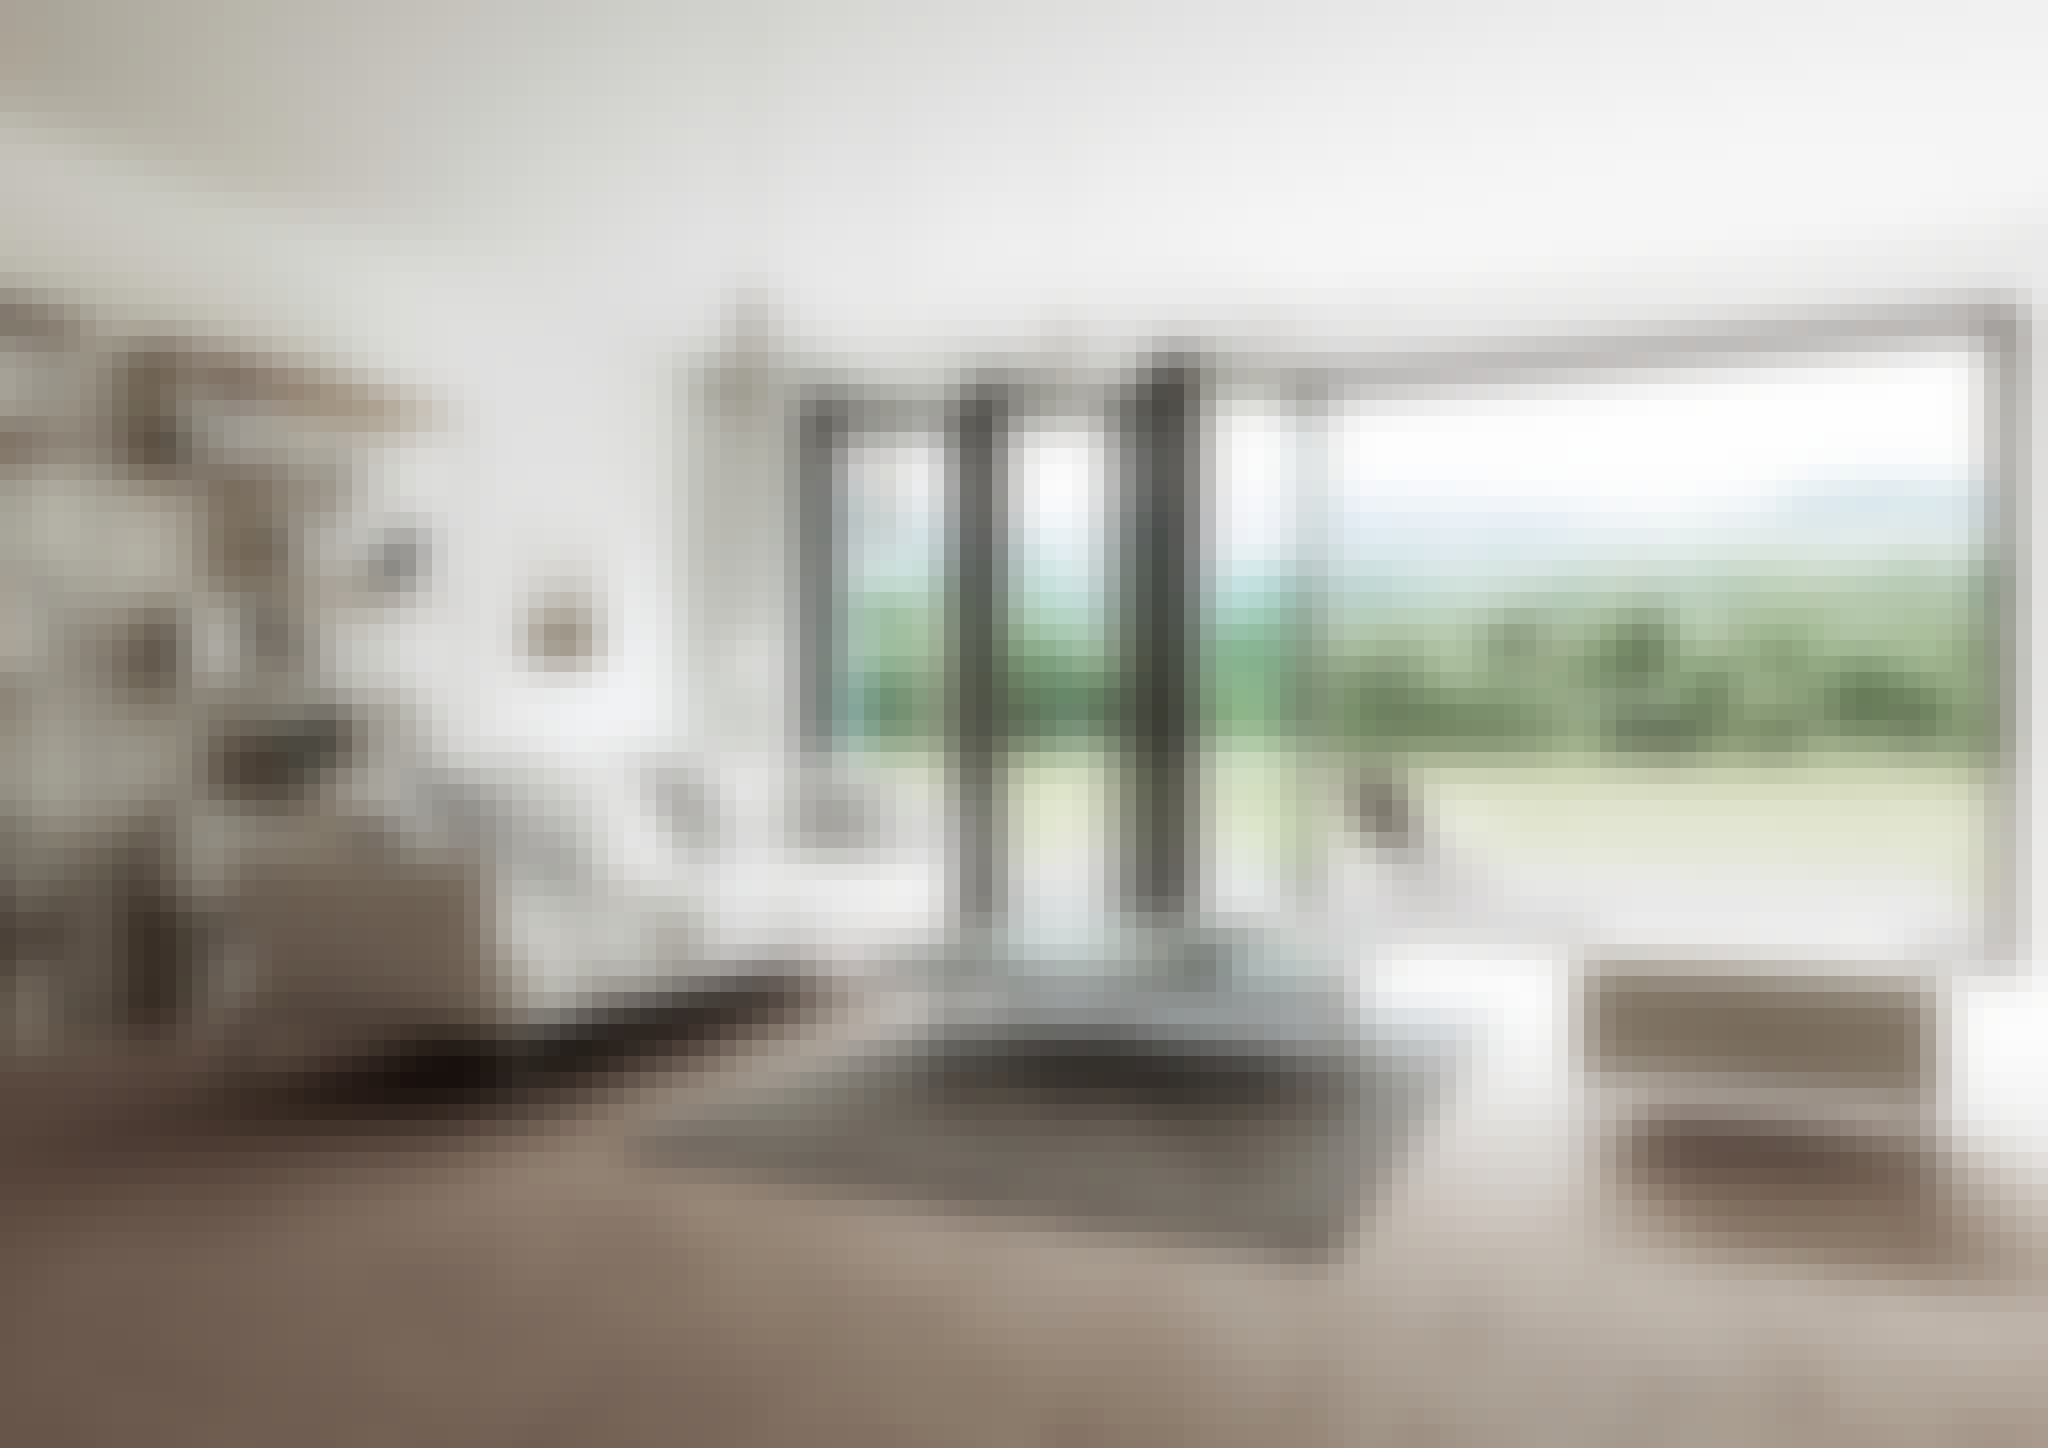 biophilc design prinicples in contemporary home design with folding glass wall